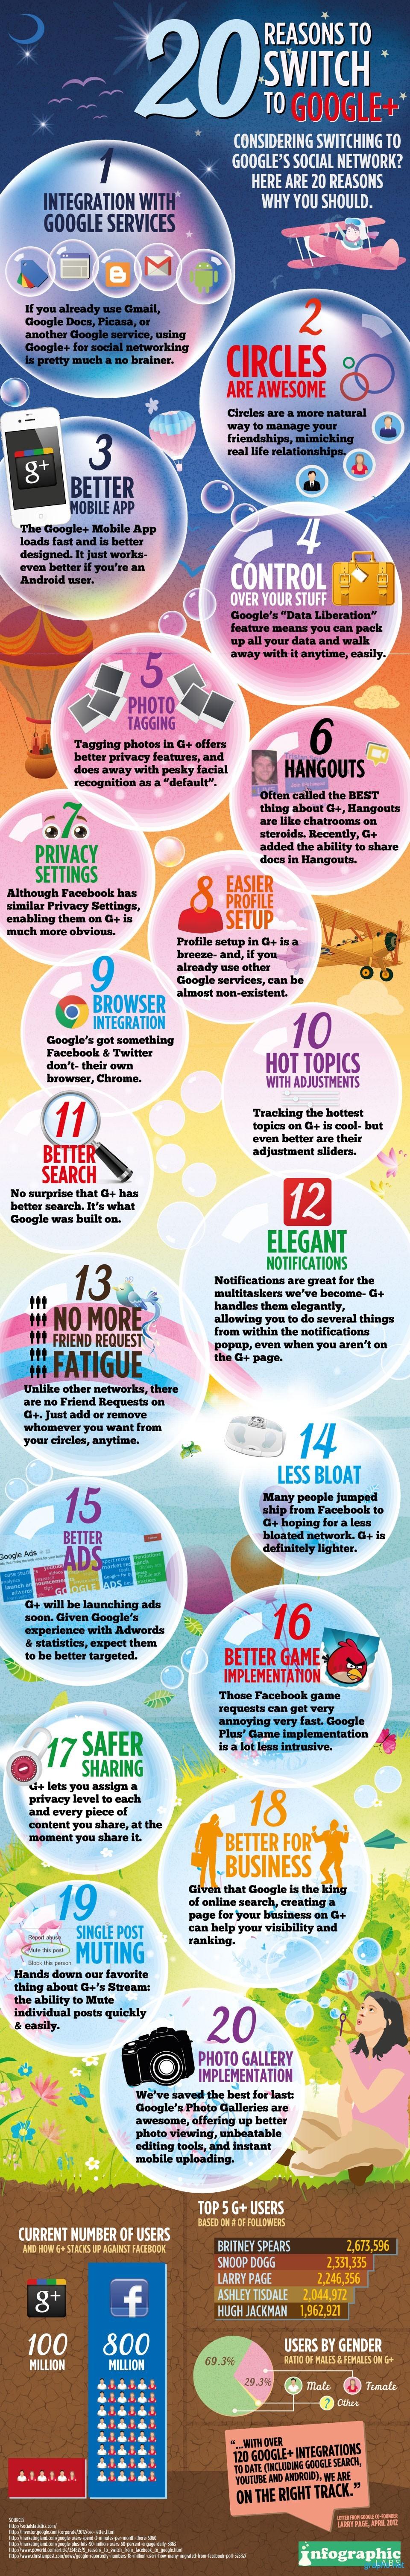 Reasons for Choosing Google+